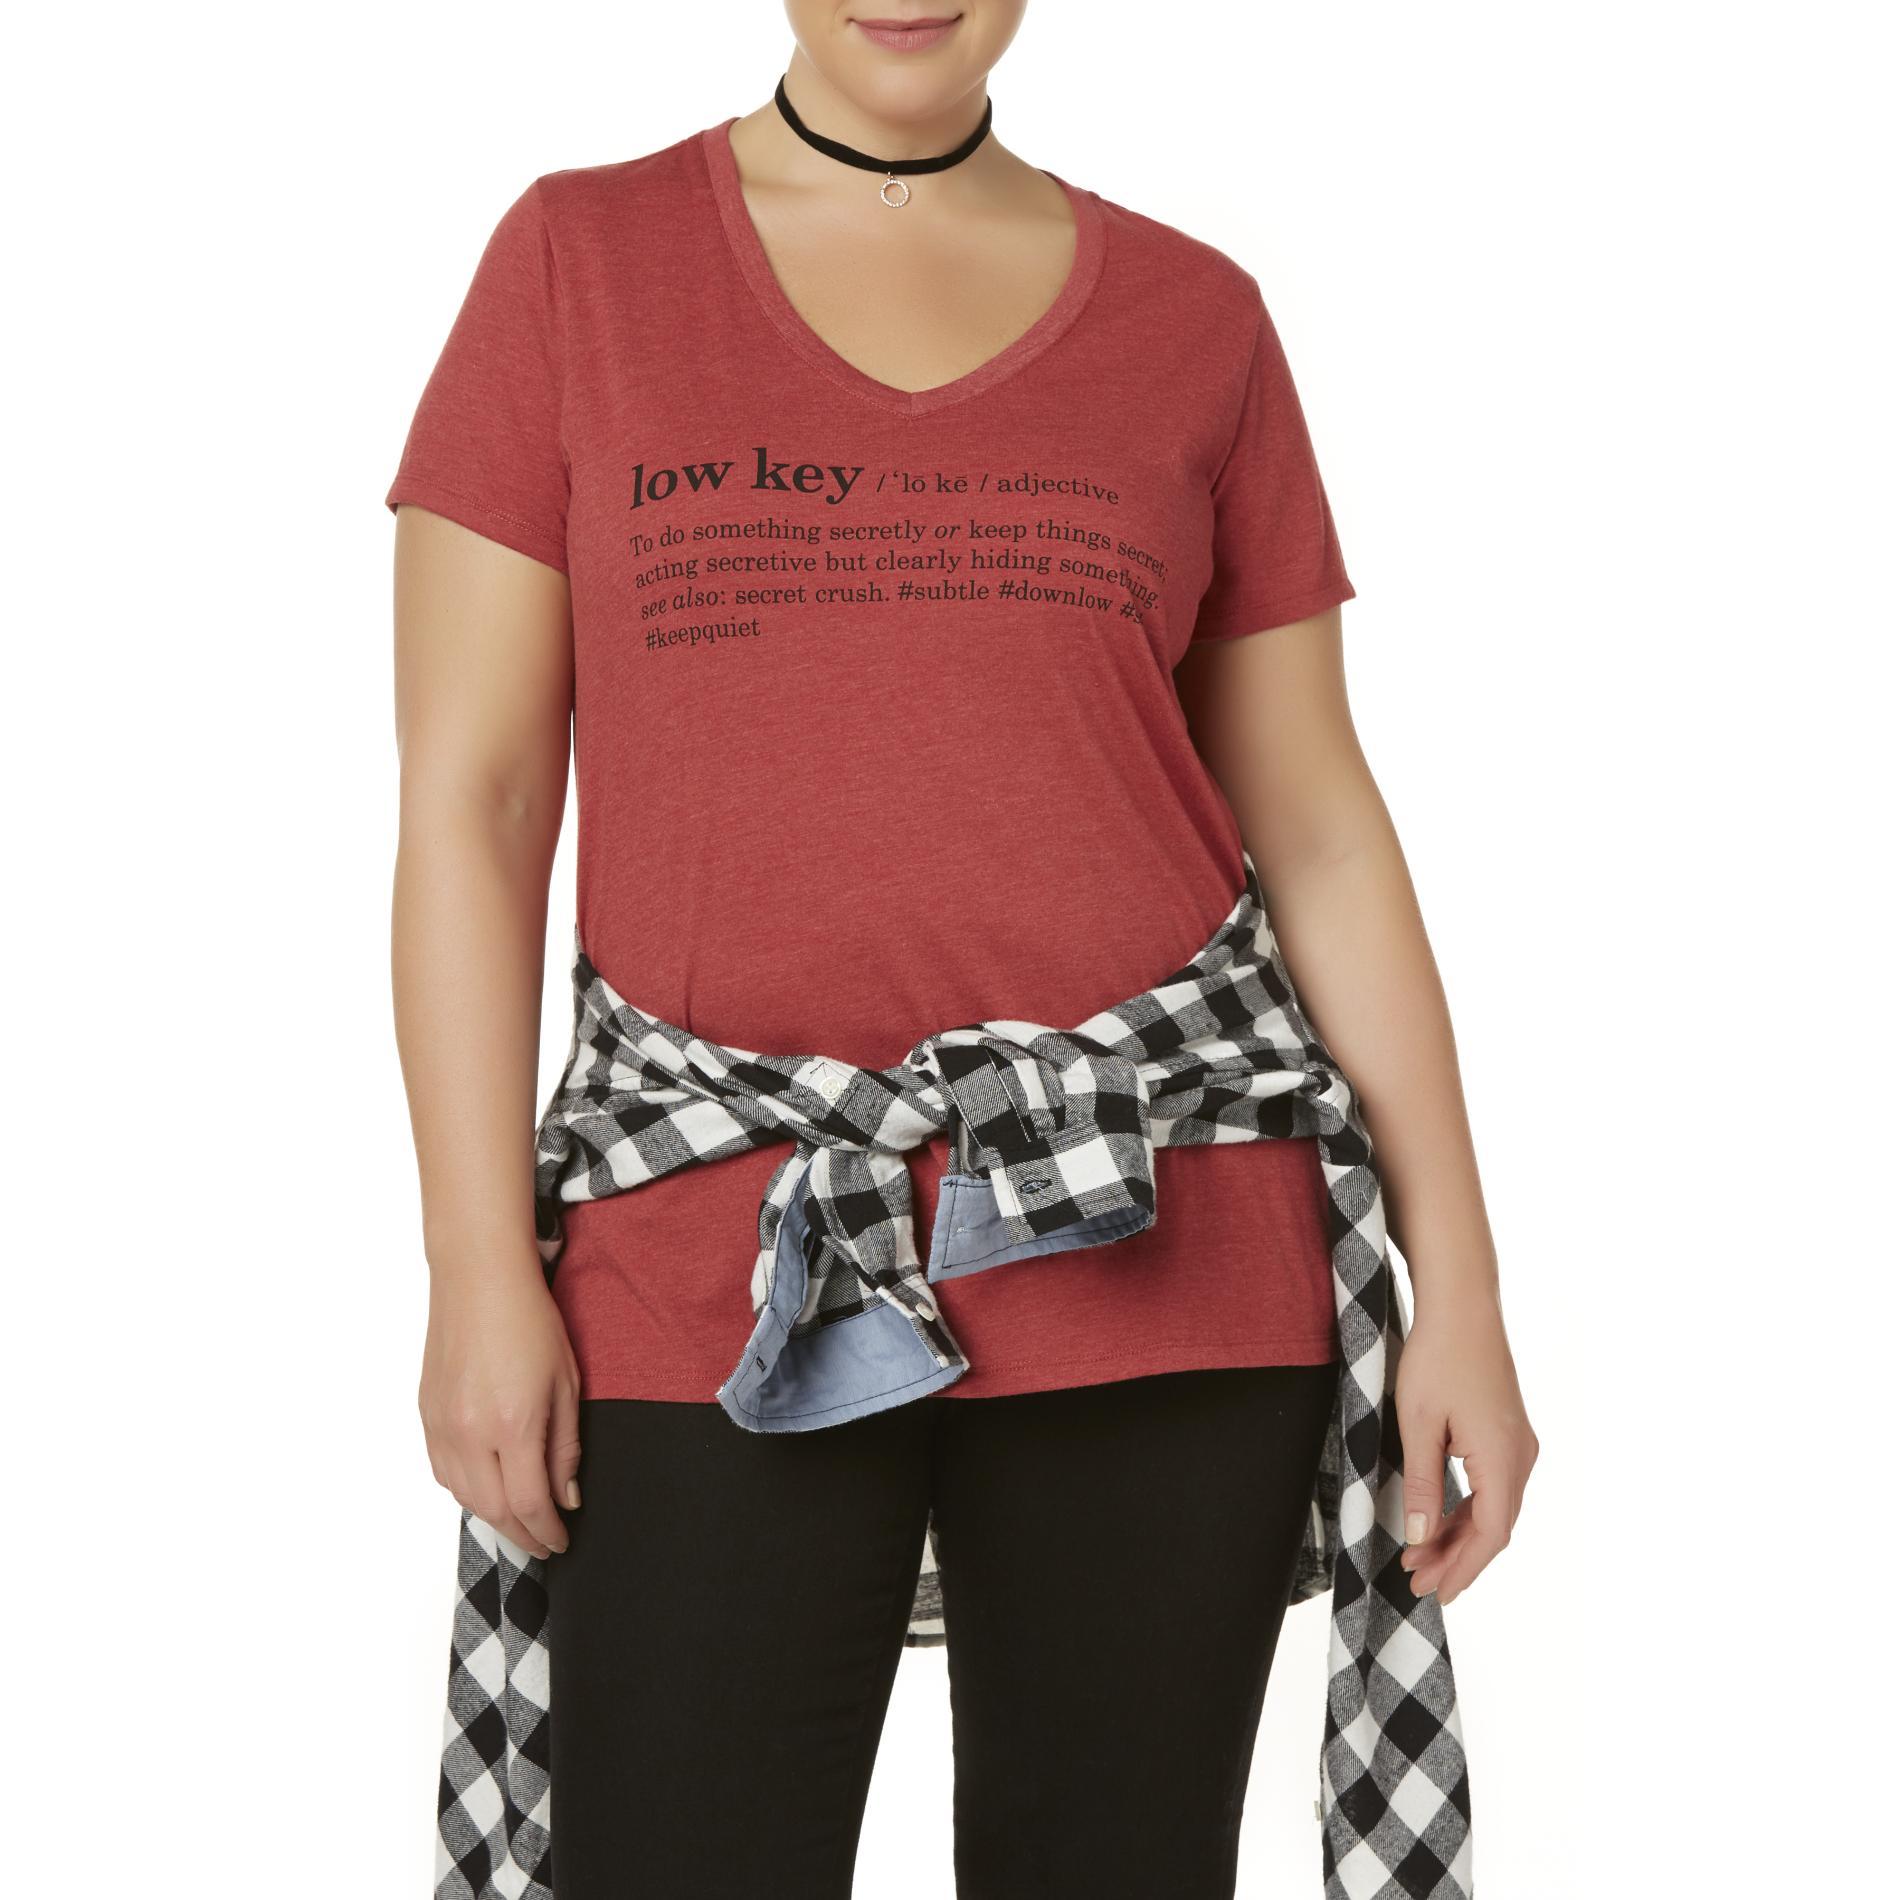 Joe Boxer Juniors' Plus V-Neck Graphic T-Shirt - Low Key PartNumber: 027VA100323412P MfgPartNumber: IHE2647